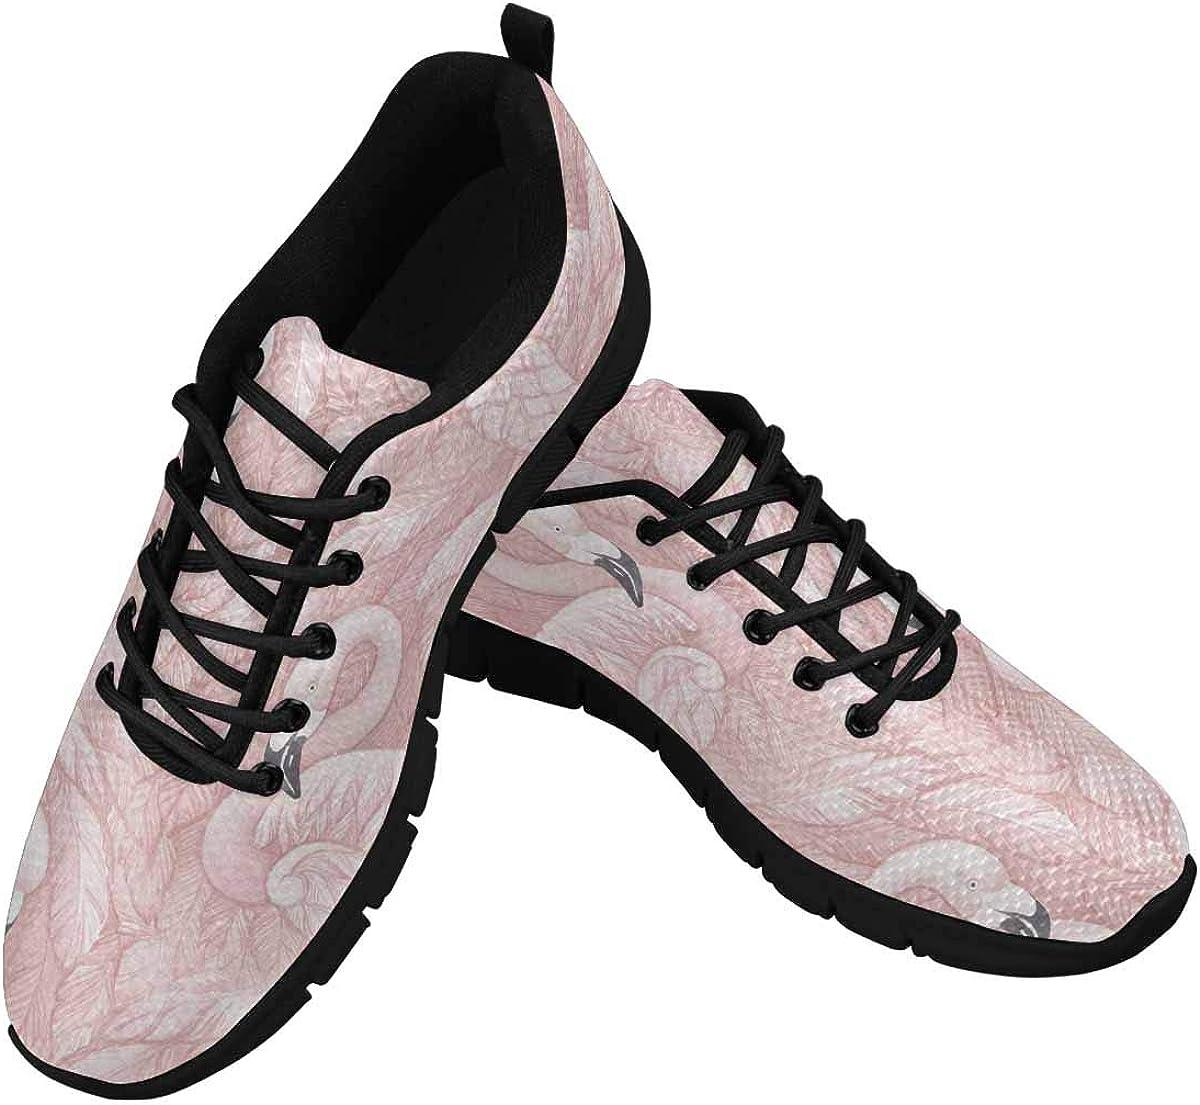 INTERESTPRINT Pink Flamingo Lightweight Mesh Breathable Sneakers for Women